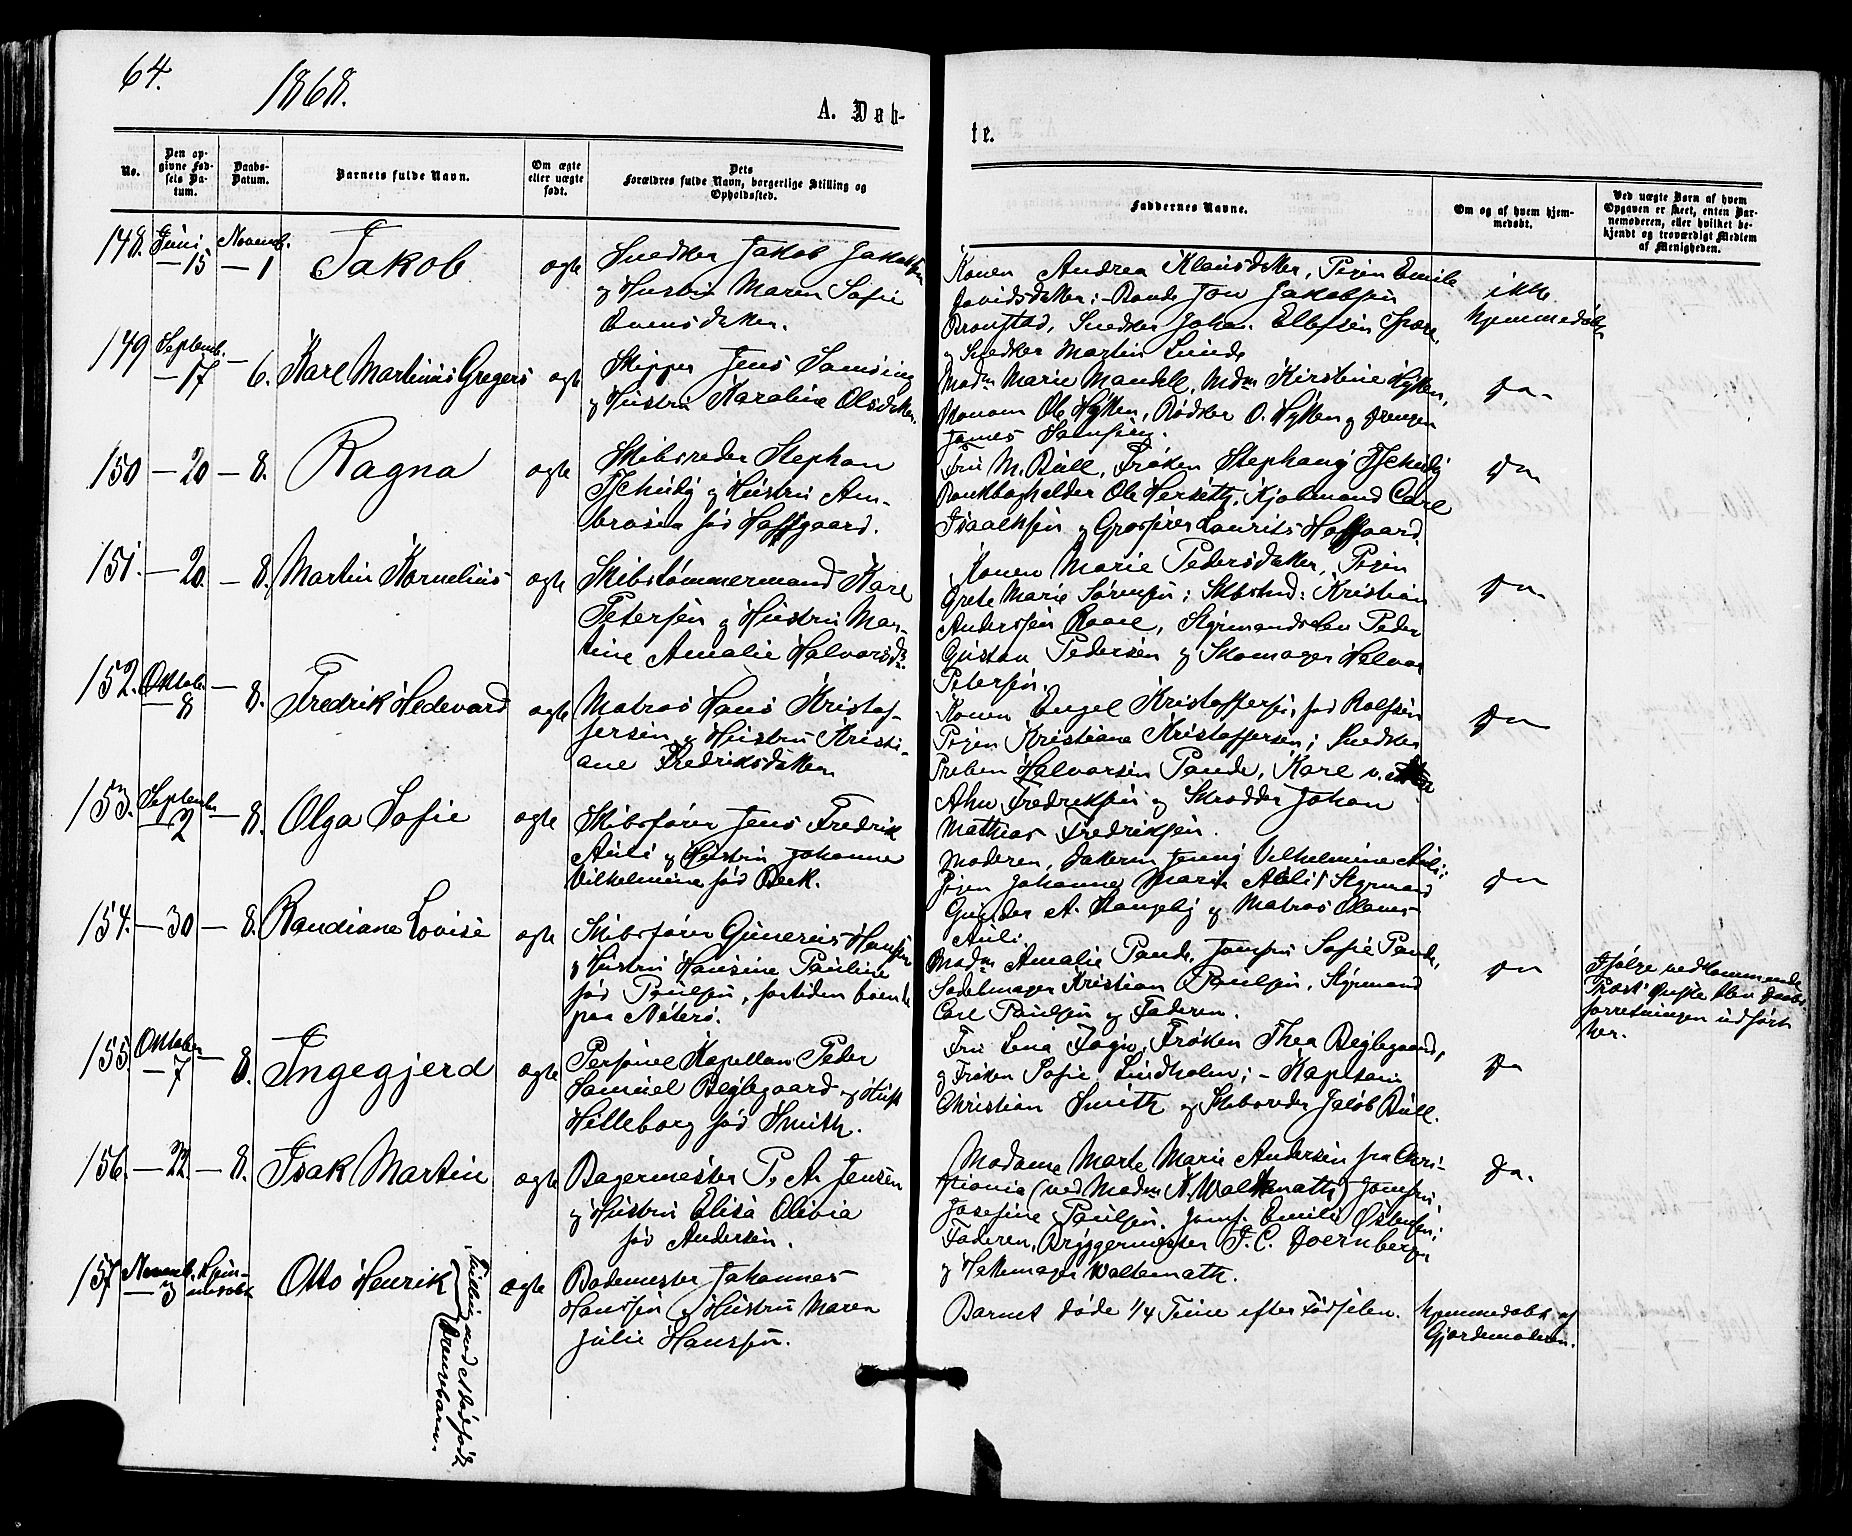 SAKO, Tønsberg kirkebøker, F/Fa/L0009: Ministerialbok nr. I 9, 1865-1873, s. 64